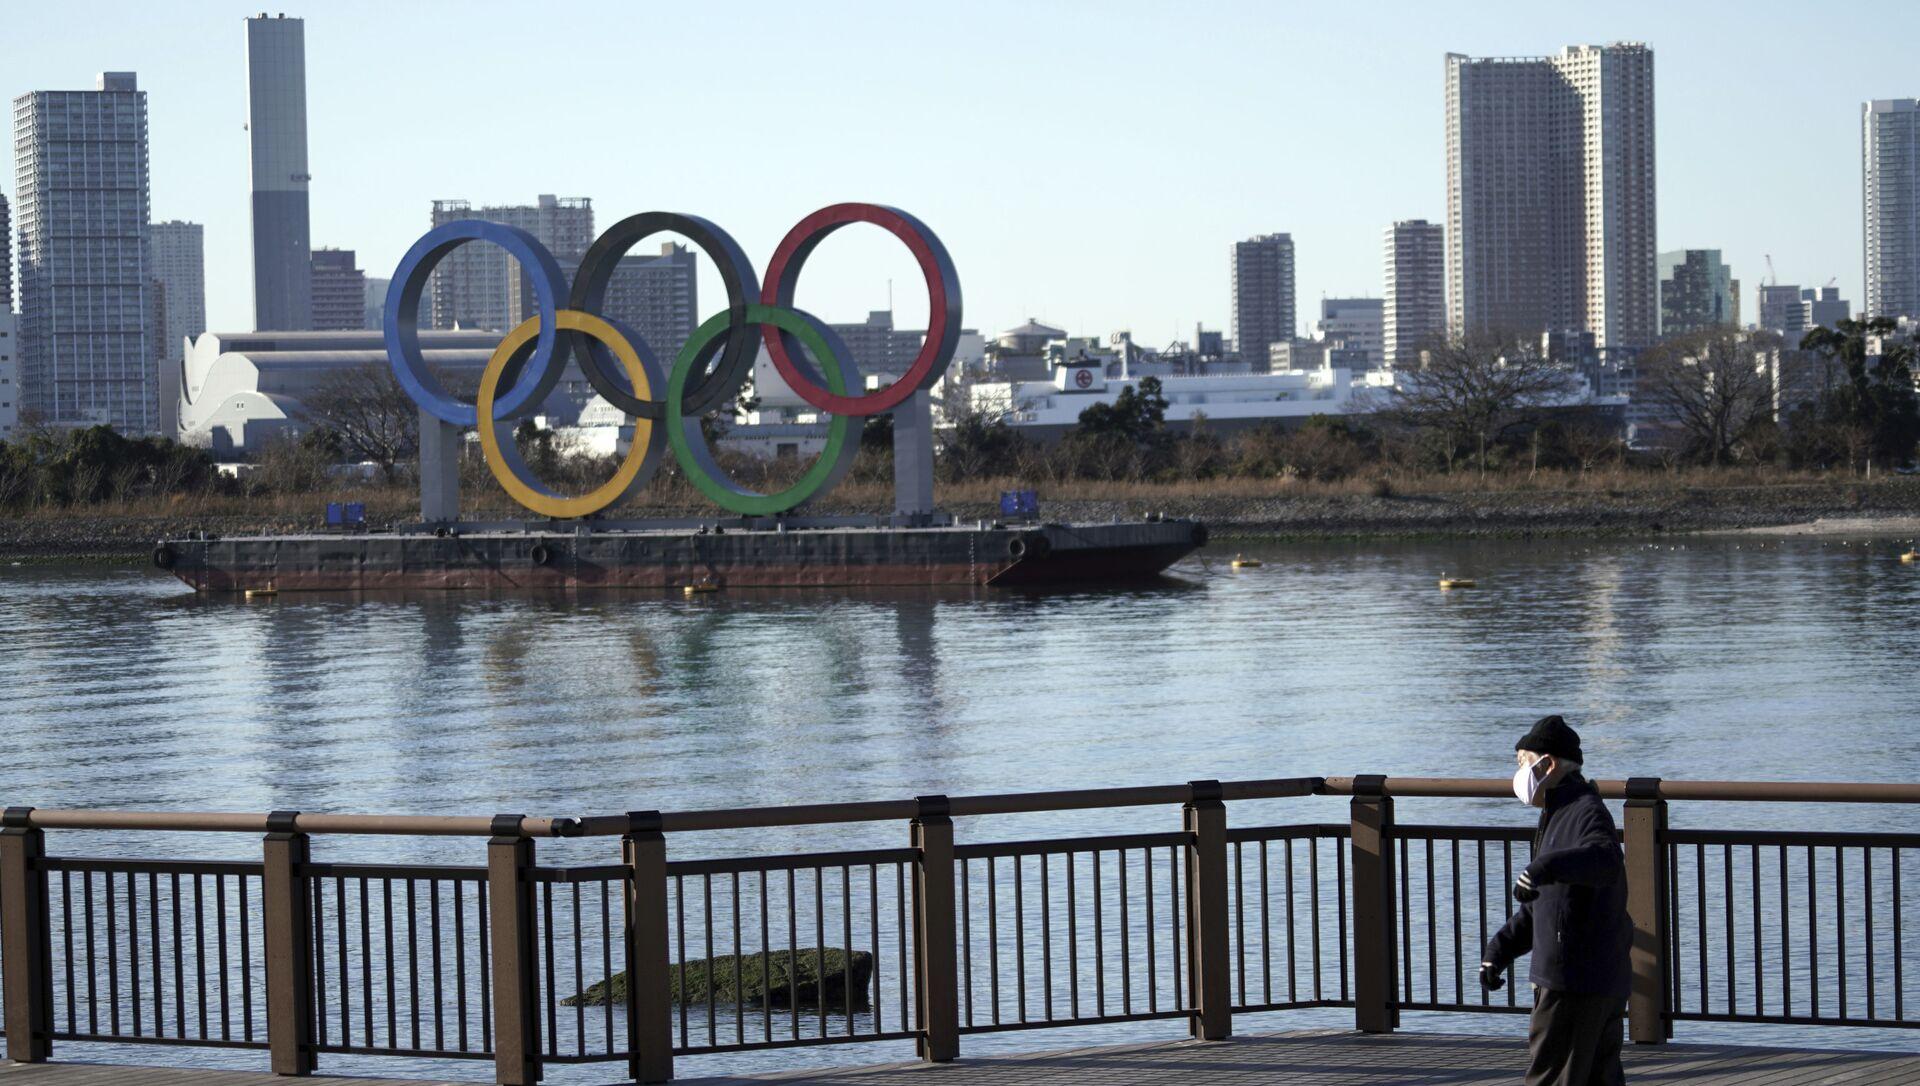 Олимпийские кольца в Токио, фото из архива - Sputnik Азербайджан, 1920, 24.08.2021